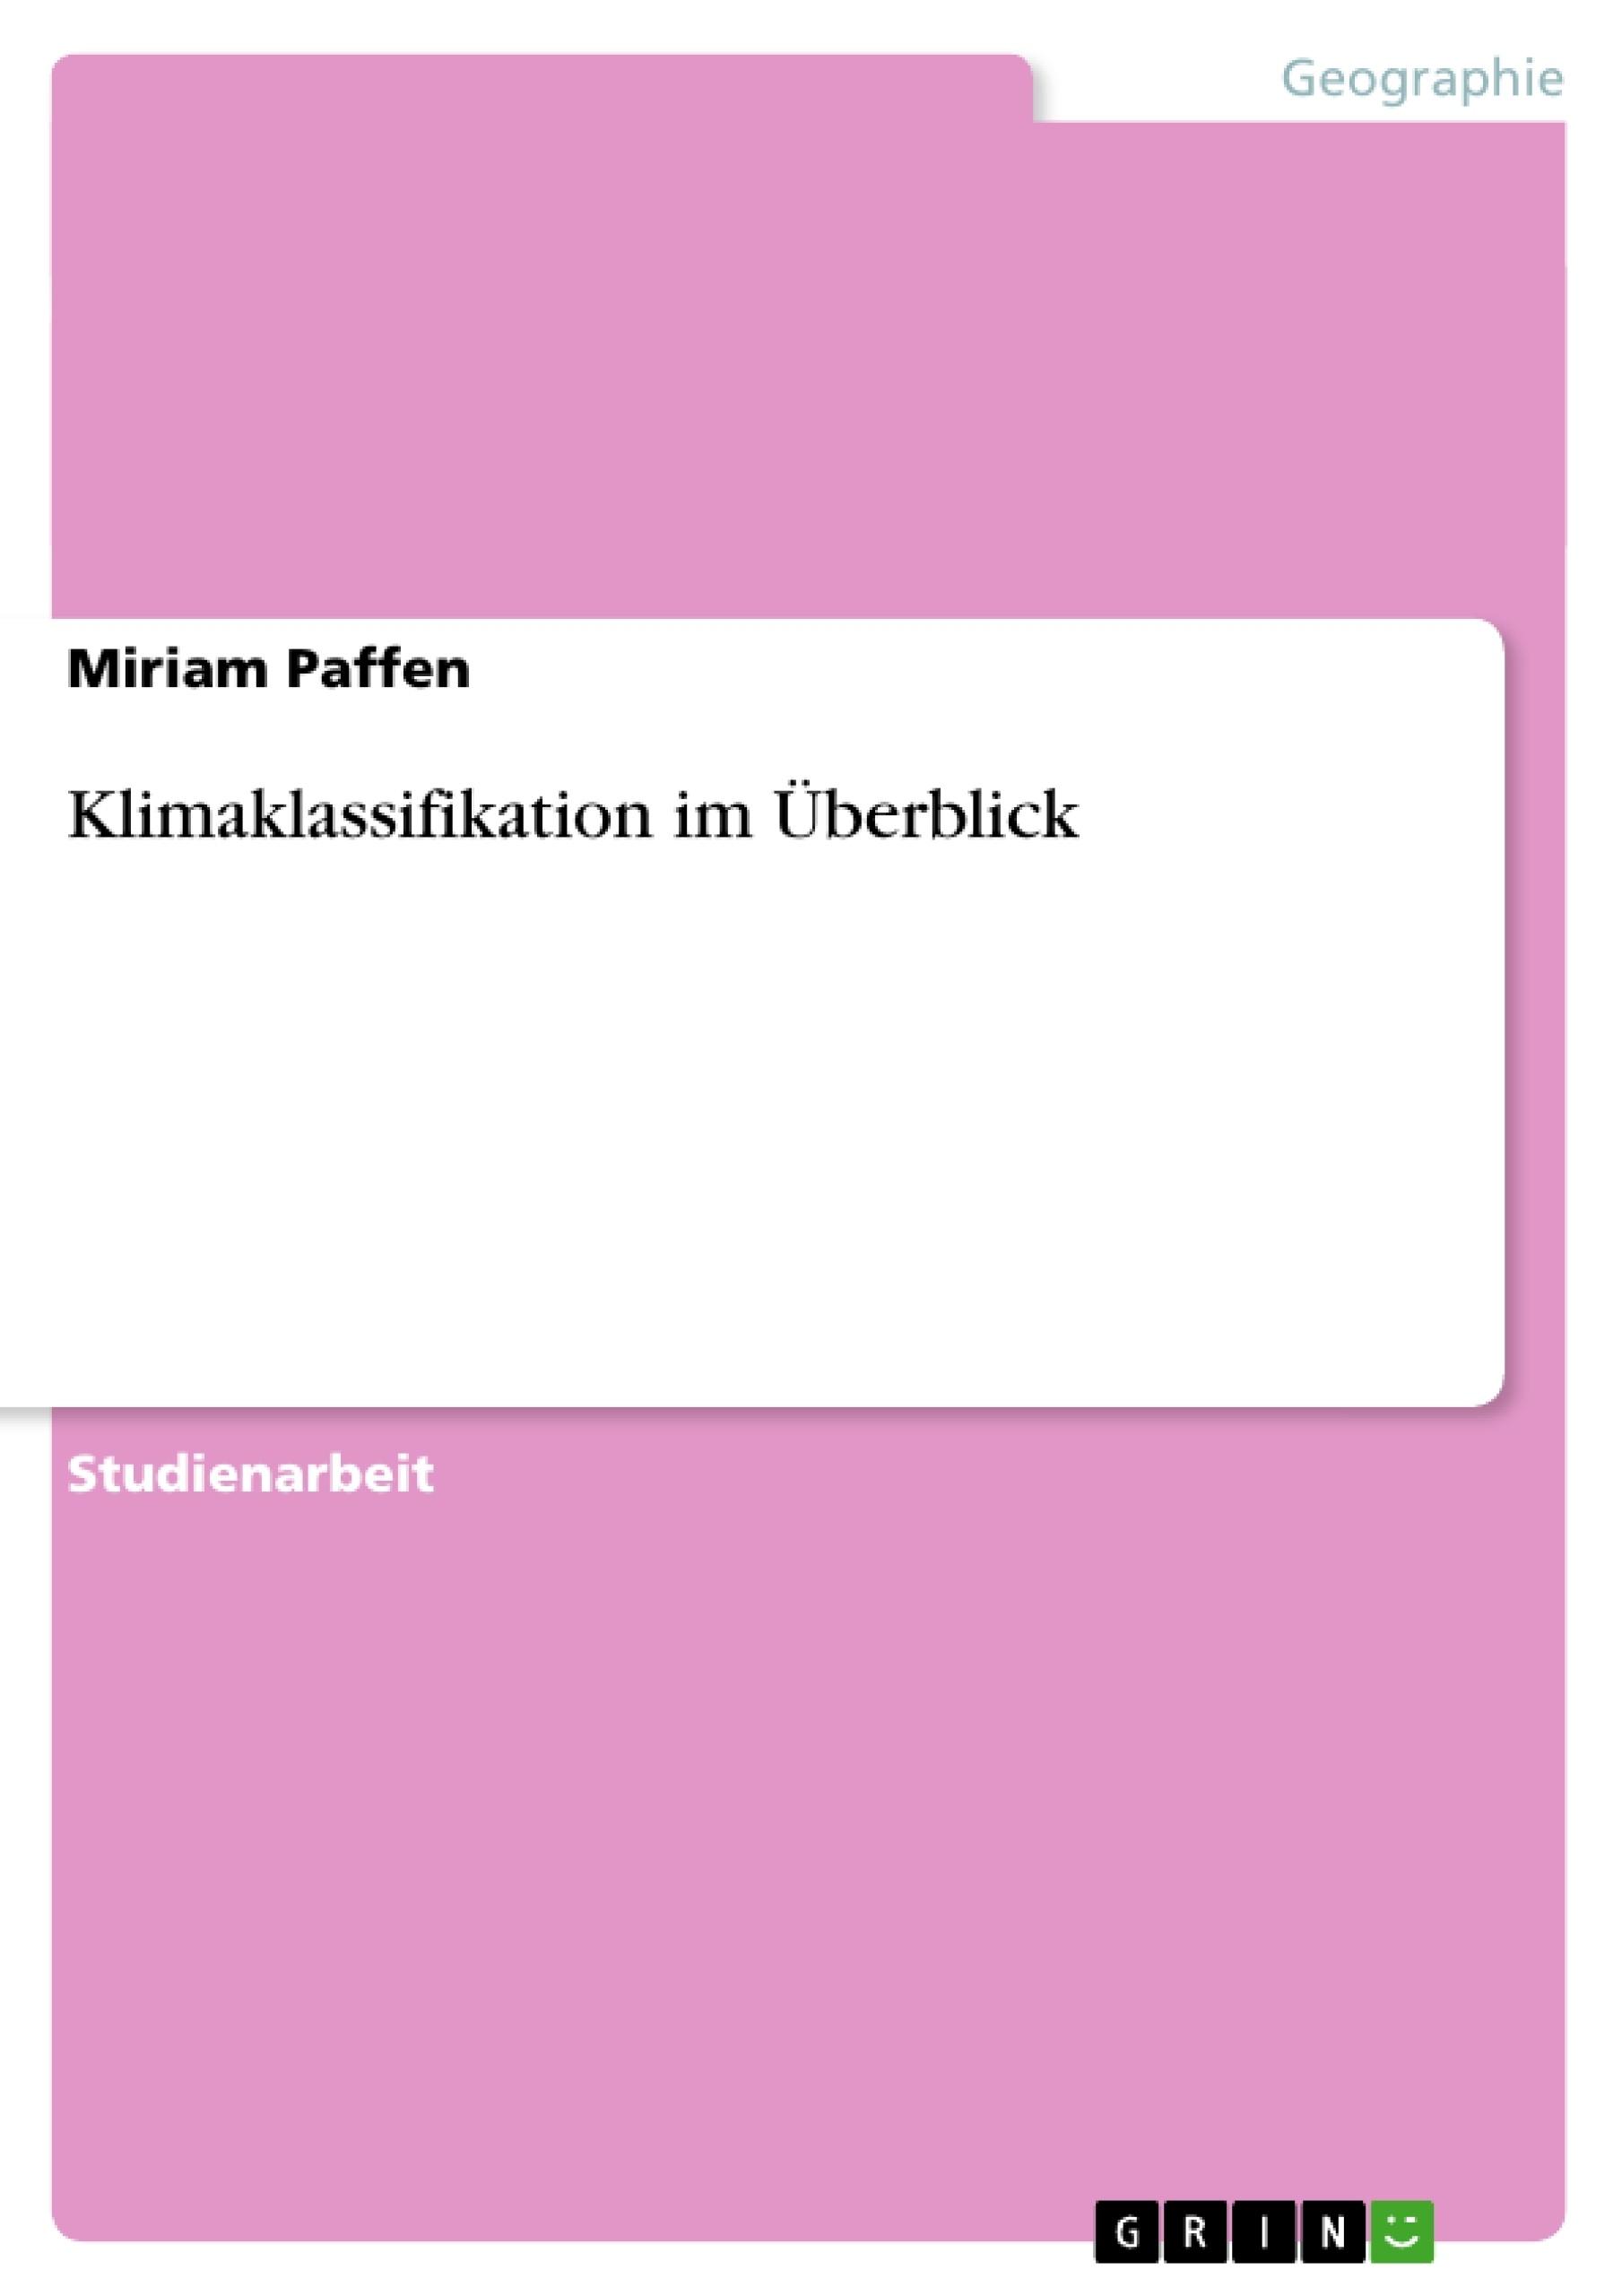 Titel: Klimaklassifikation im Überblick